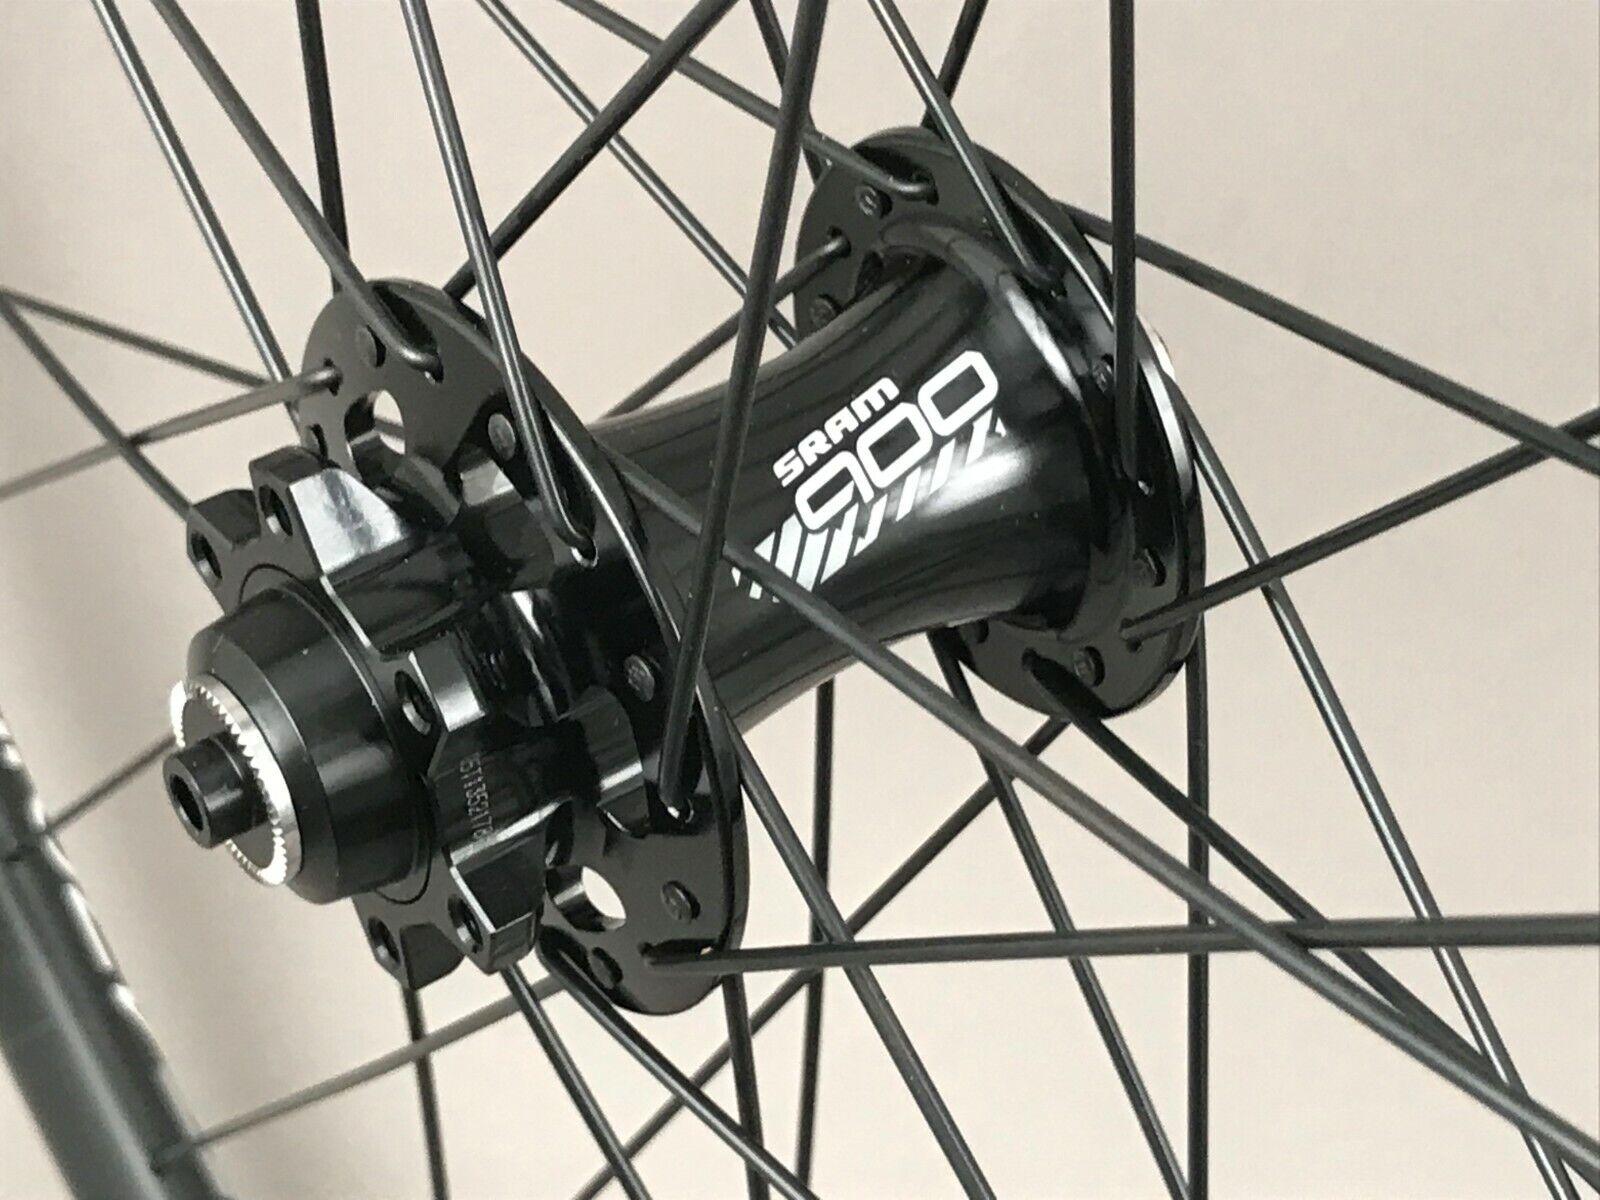 Image 2 - DT R470 Road CX Gravel Bike Disc Brake Wheelset SRAM 900 Hubs 8 9 10 11 Speed